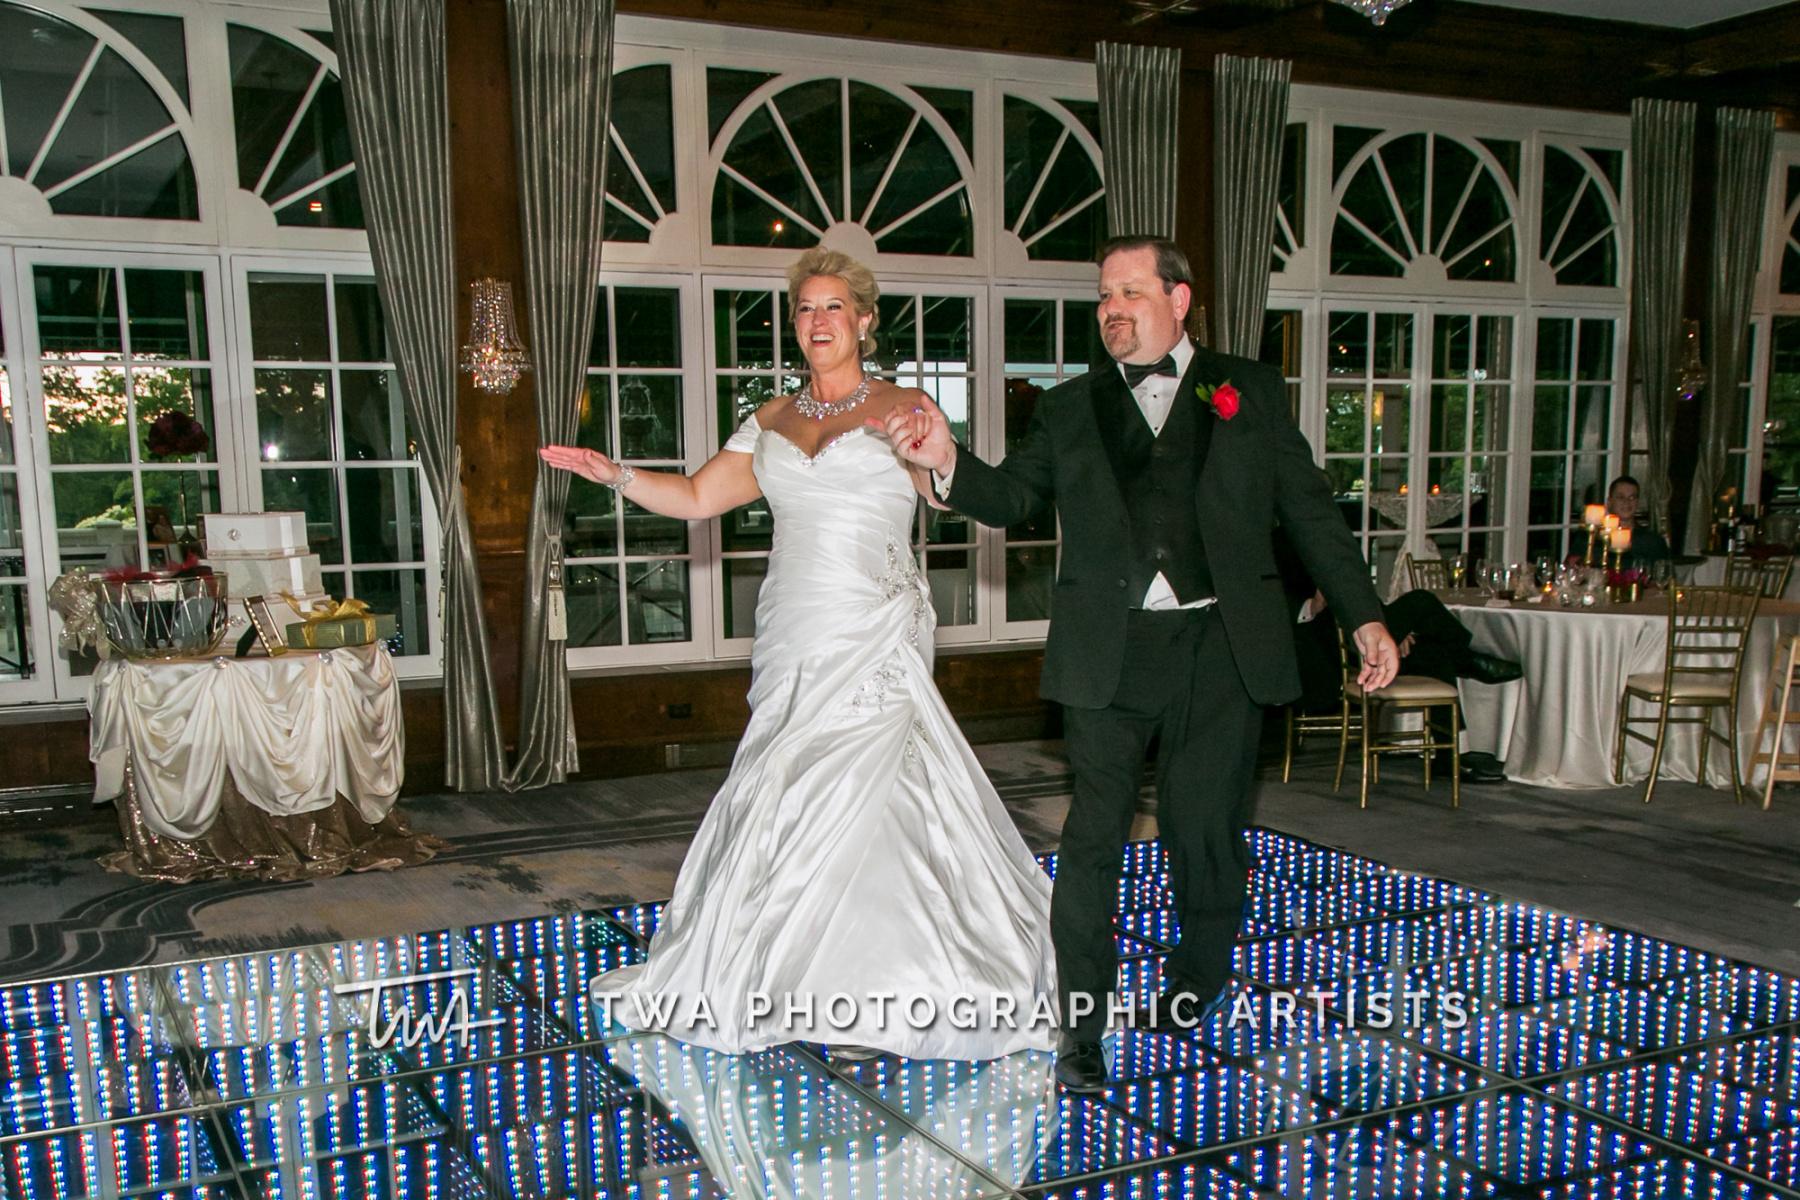 Chicago-Wedding-Photographer-TWA-Photographic-Artists-Drake-Hotal-Oak-Brook_Klein_Roberts-1070